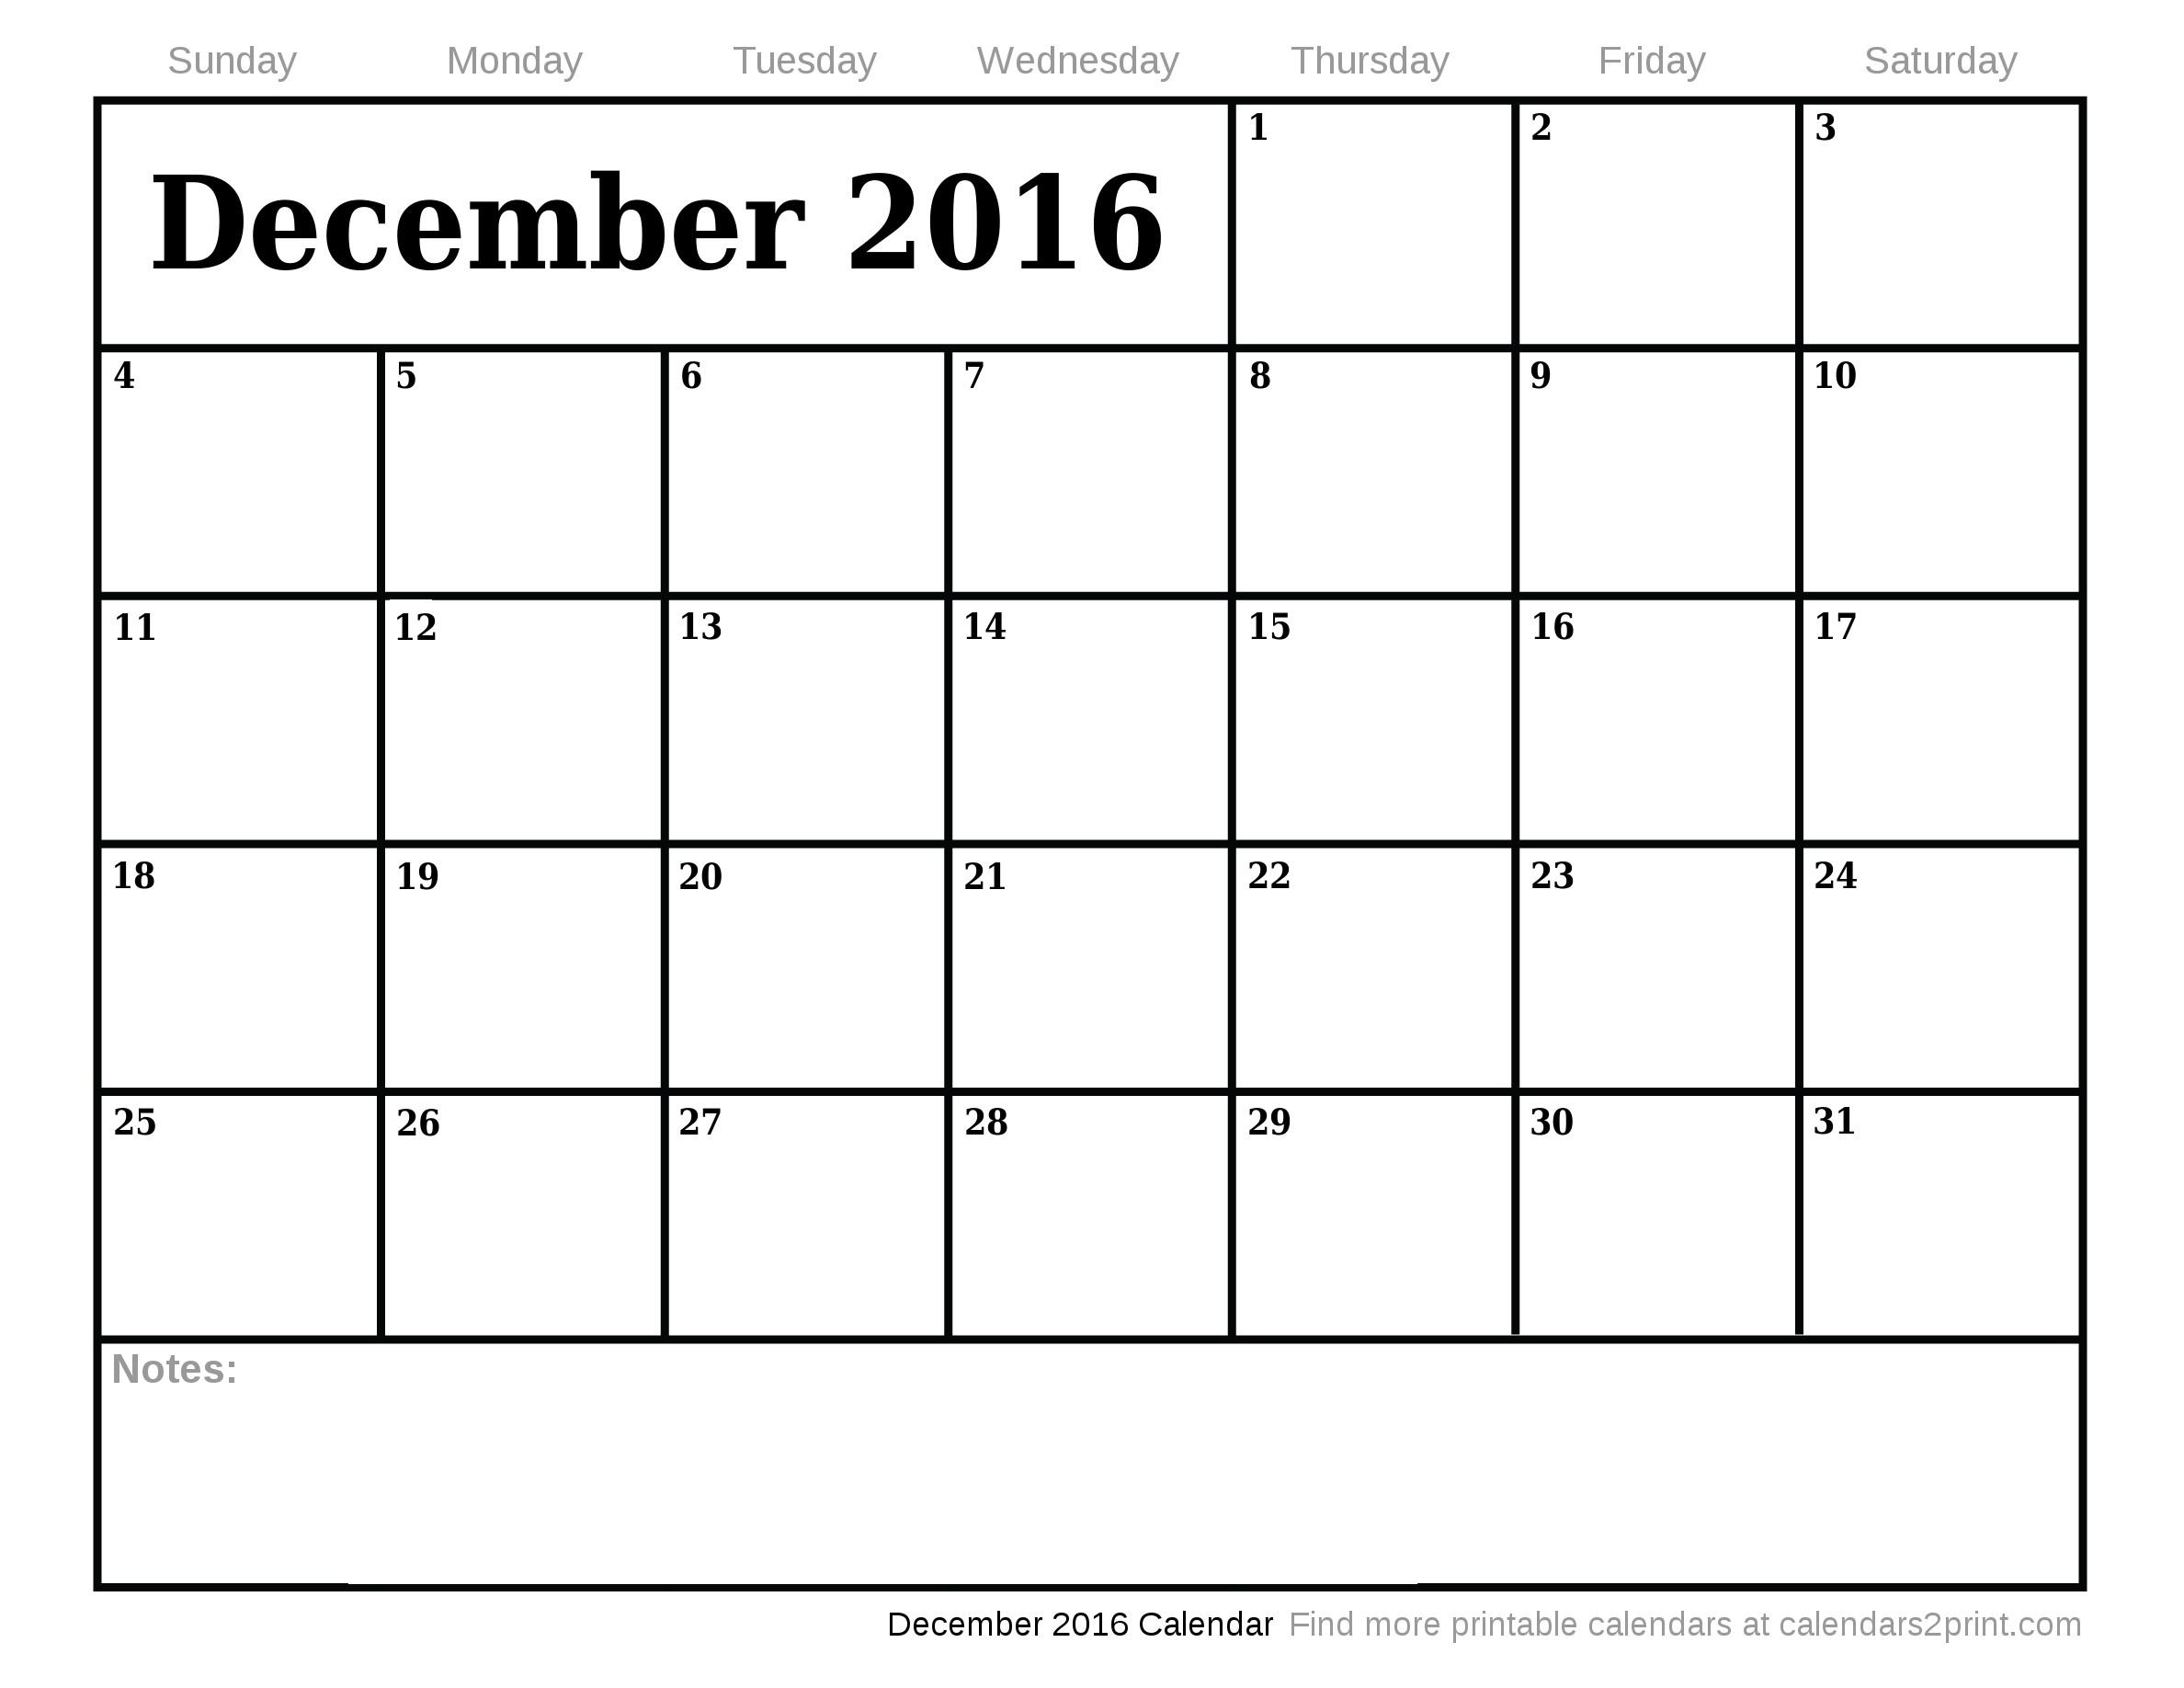 December 2016 Printable Calendar